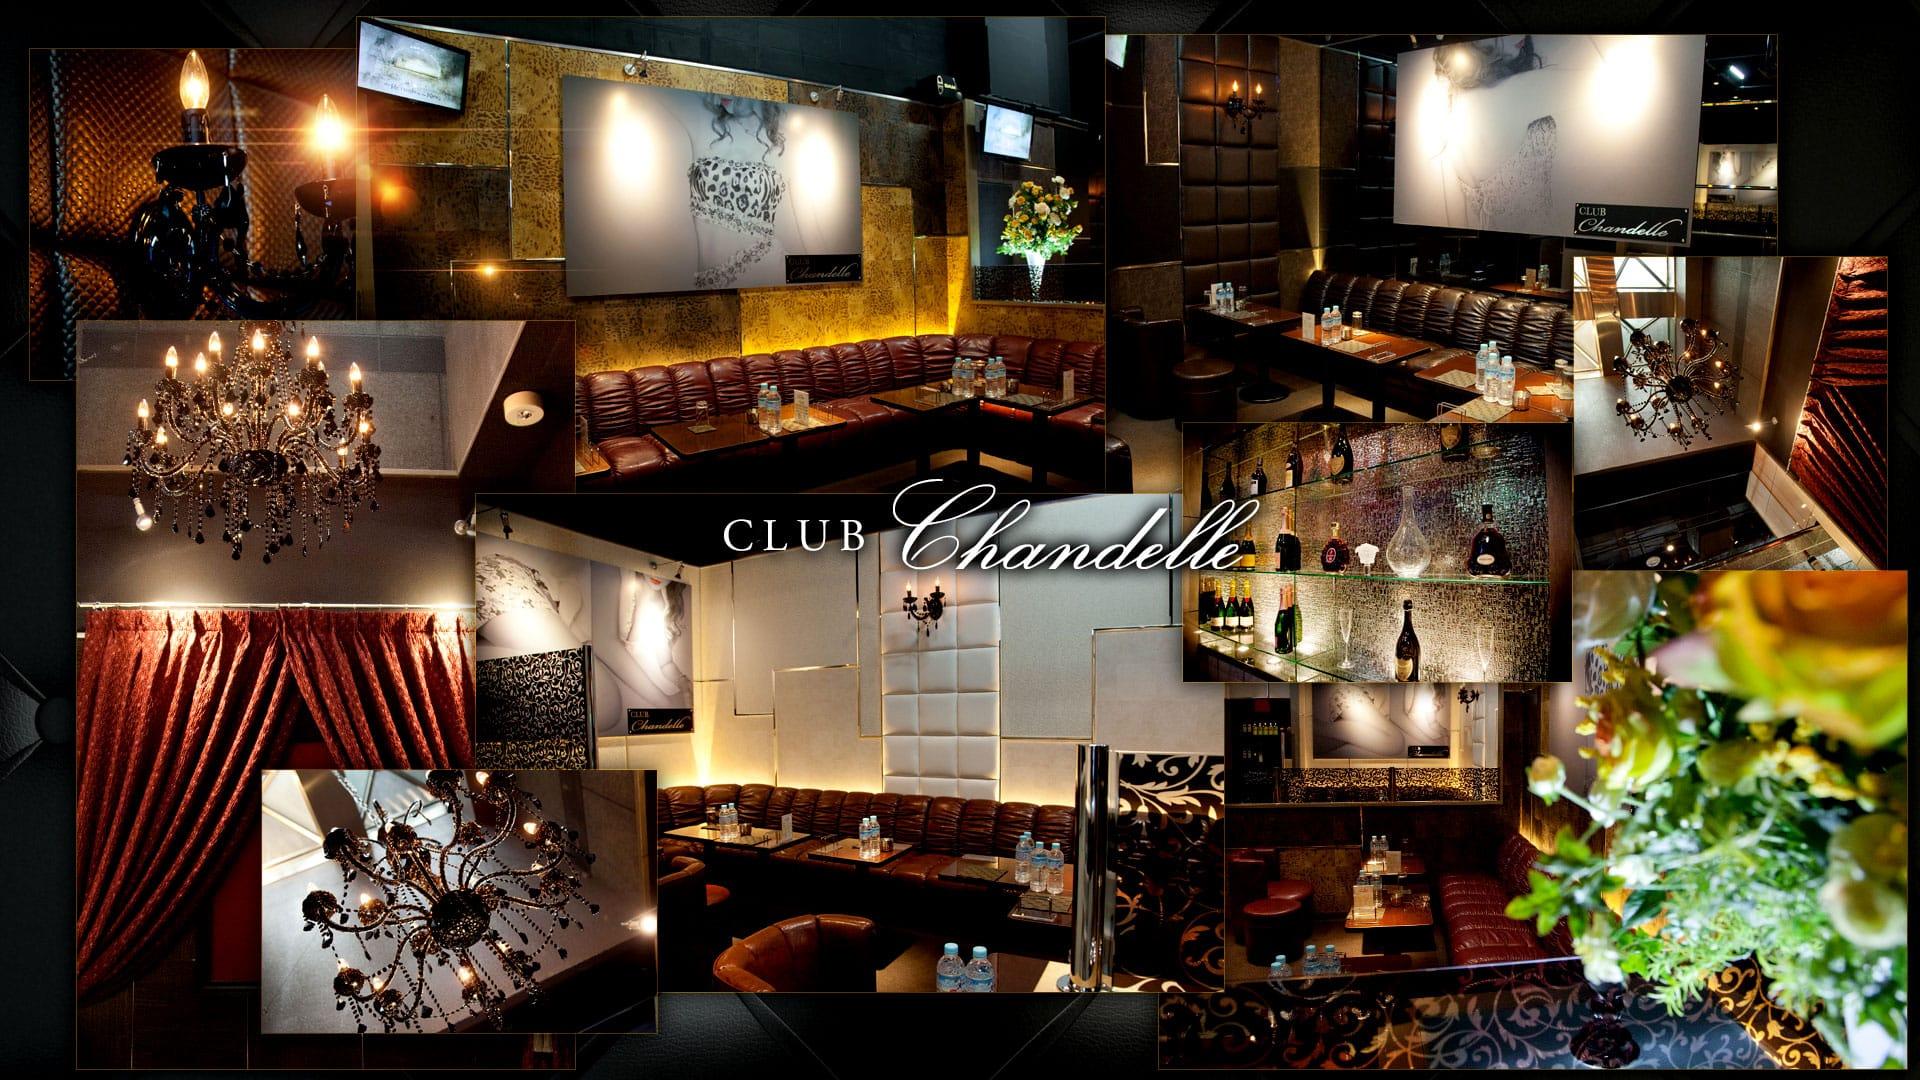 Club Chandelle[クラブ シャンデル] TOP画像